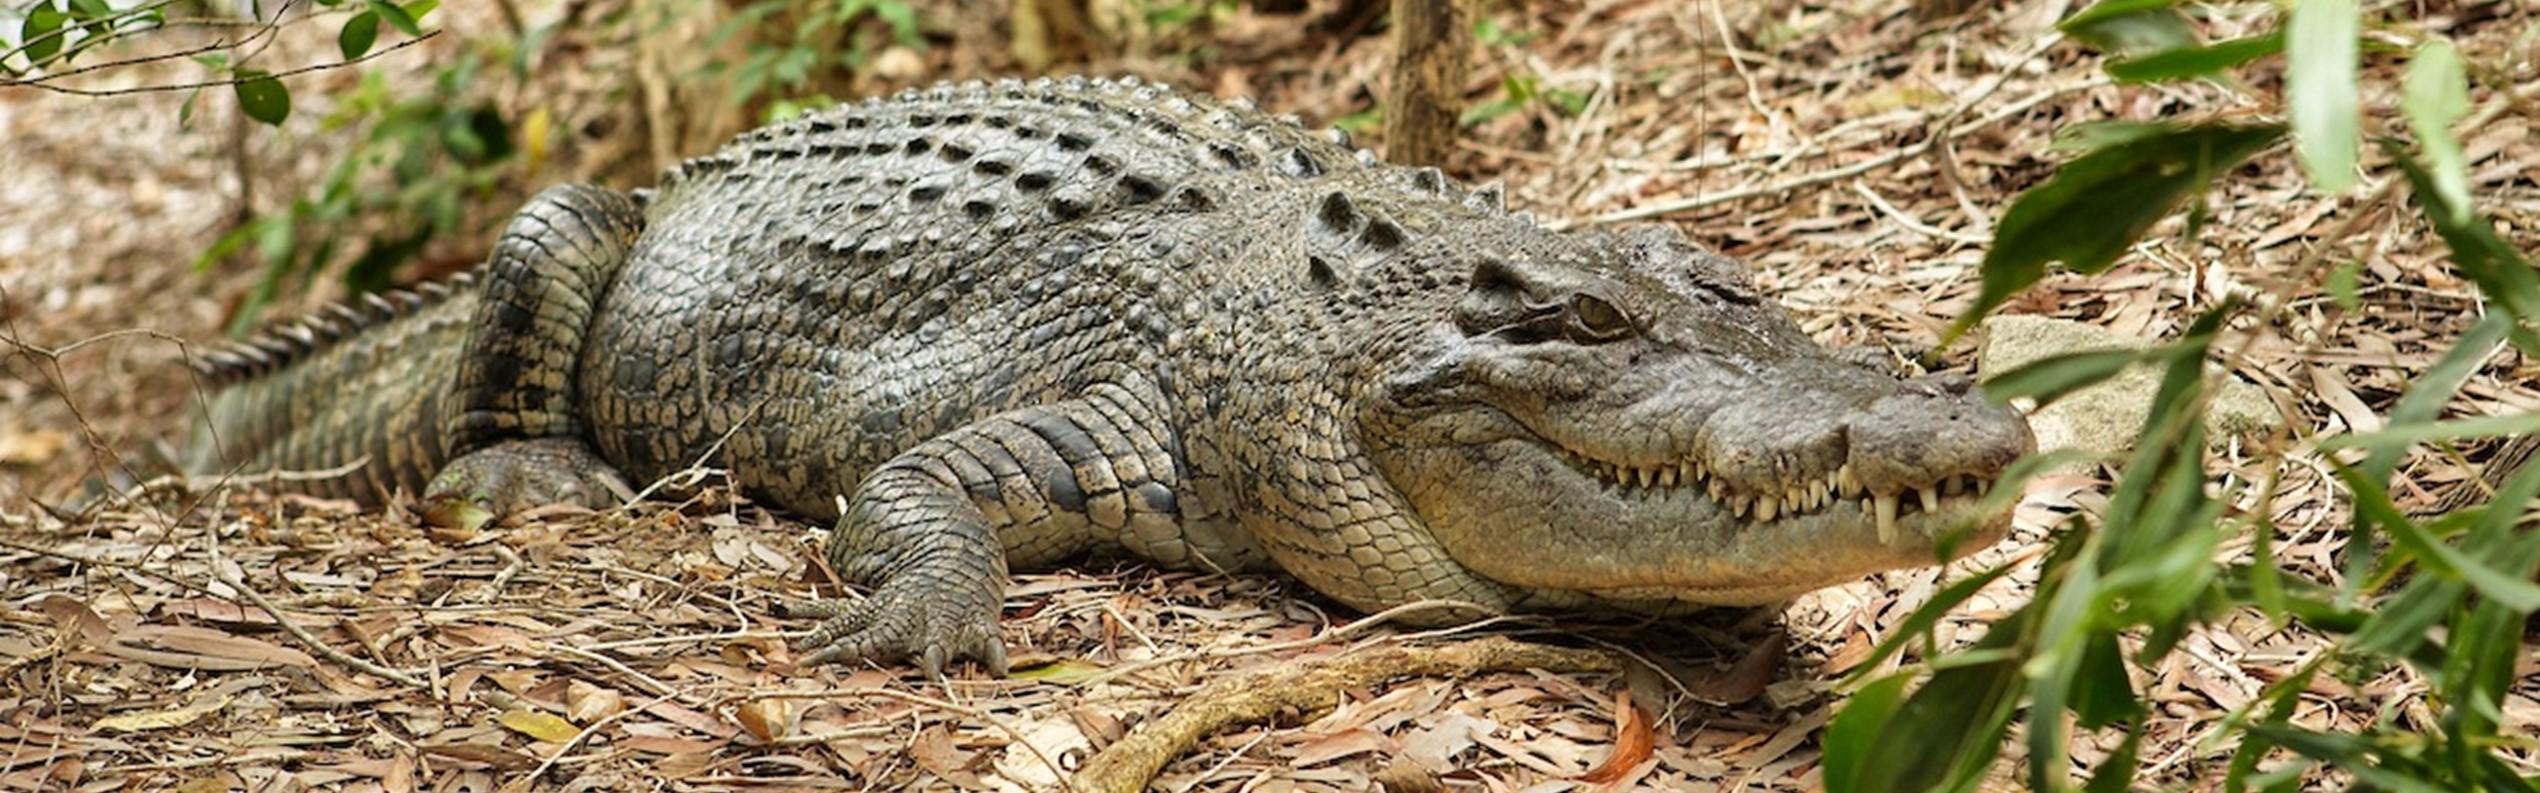 Hartley's Crocodile Adventure (PM)